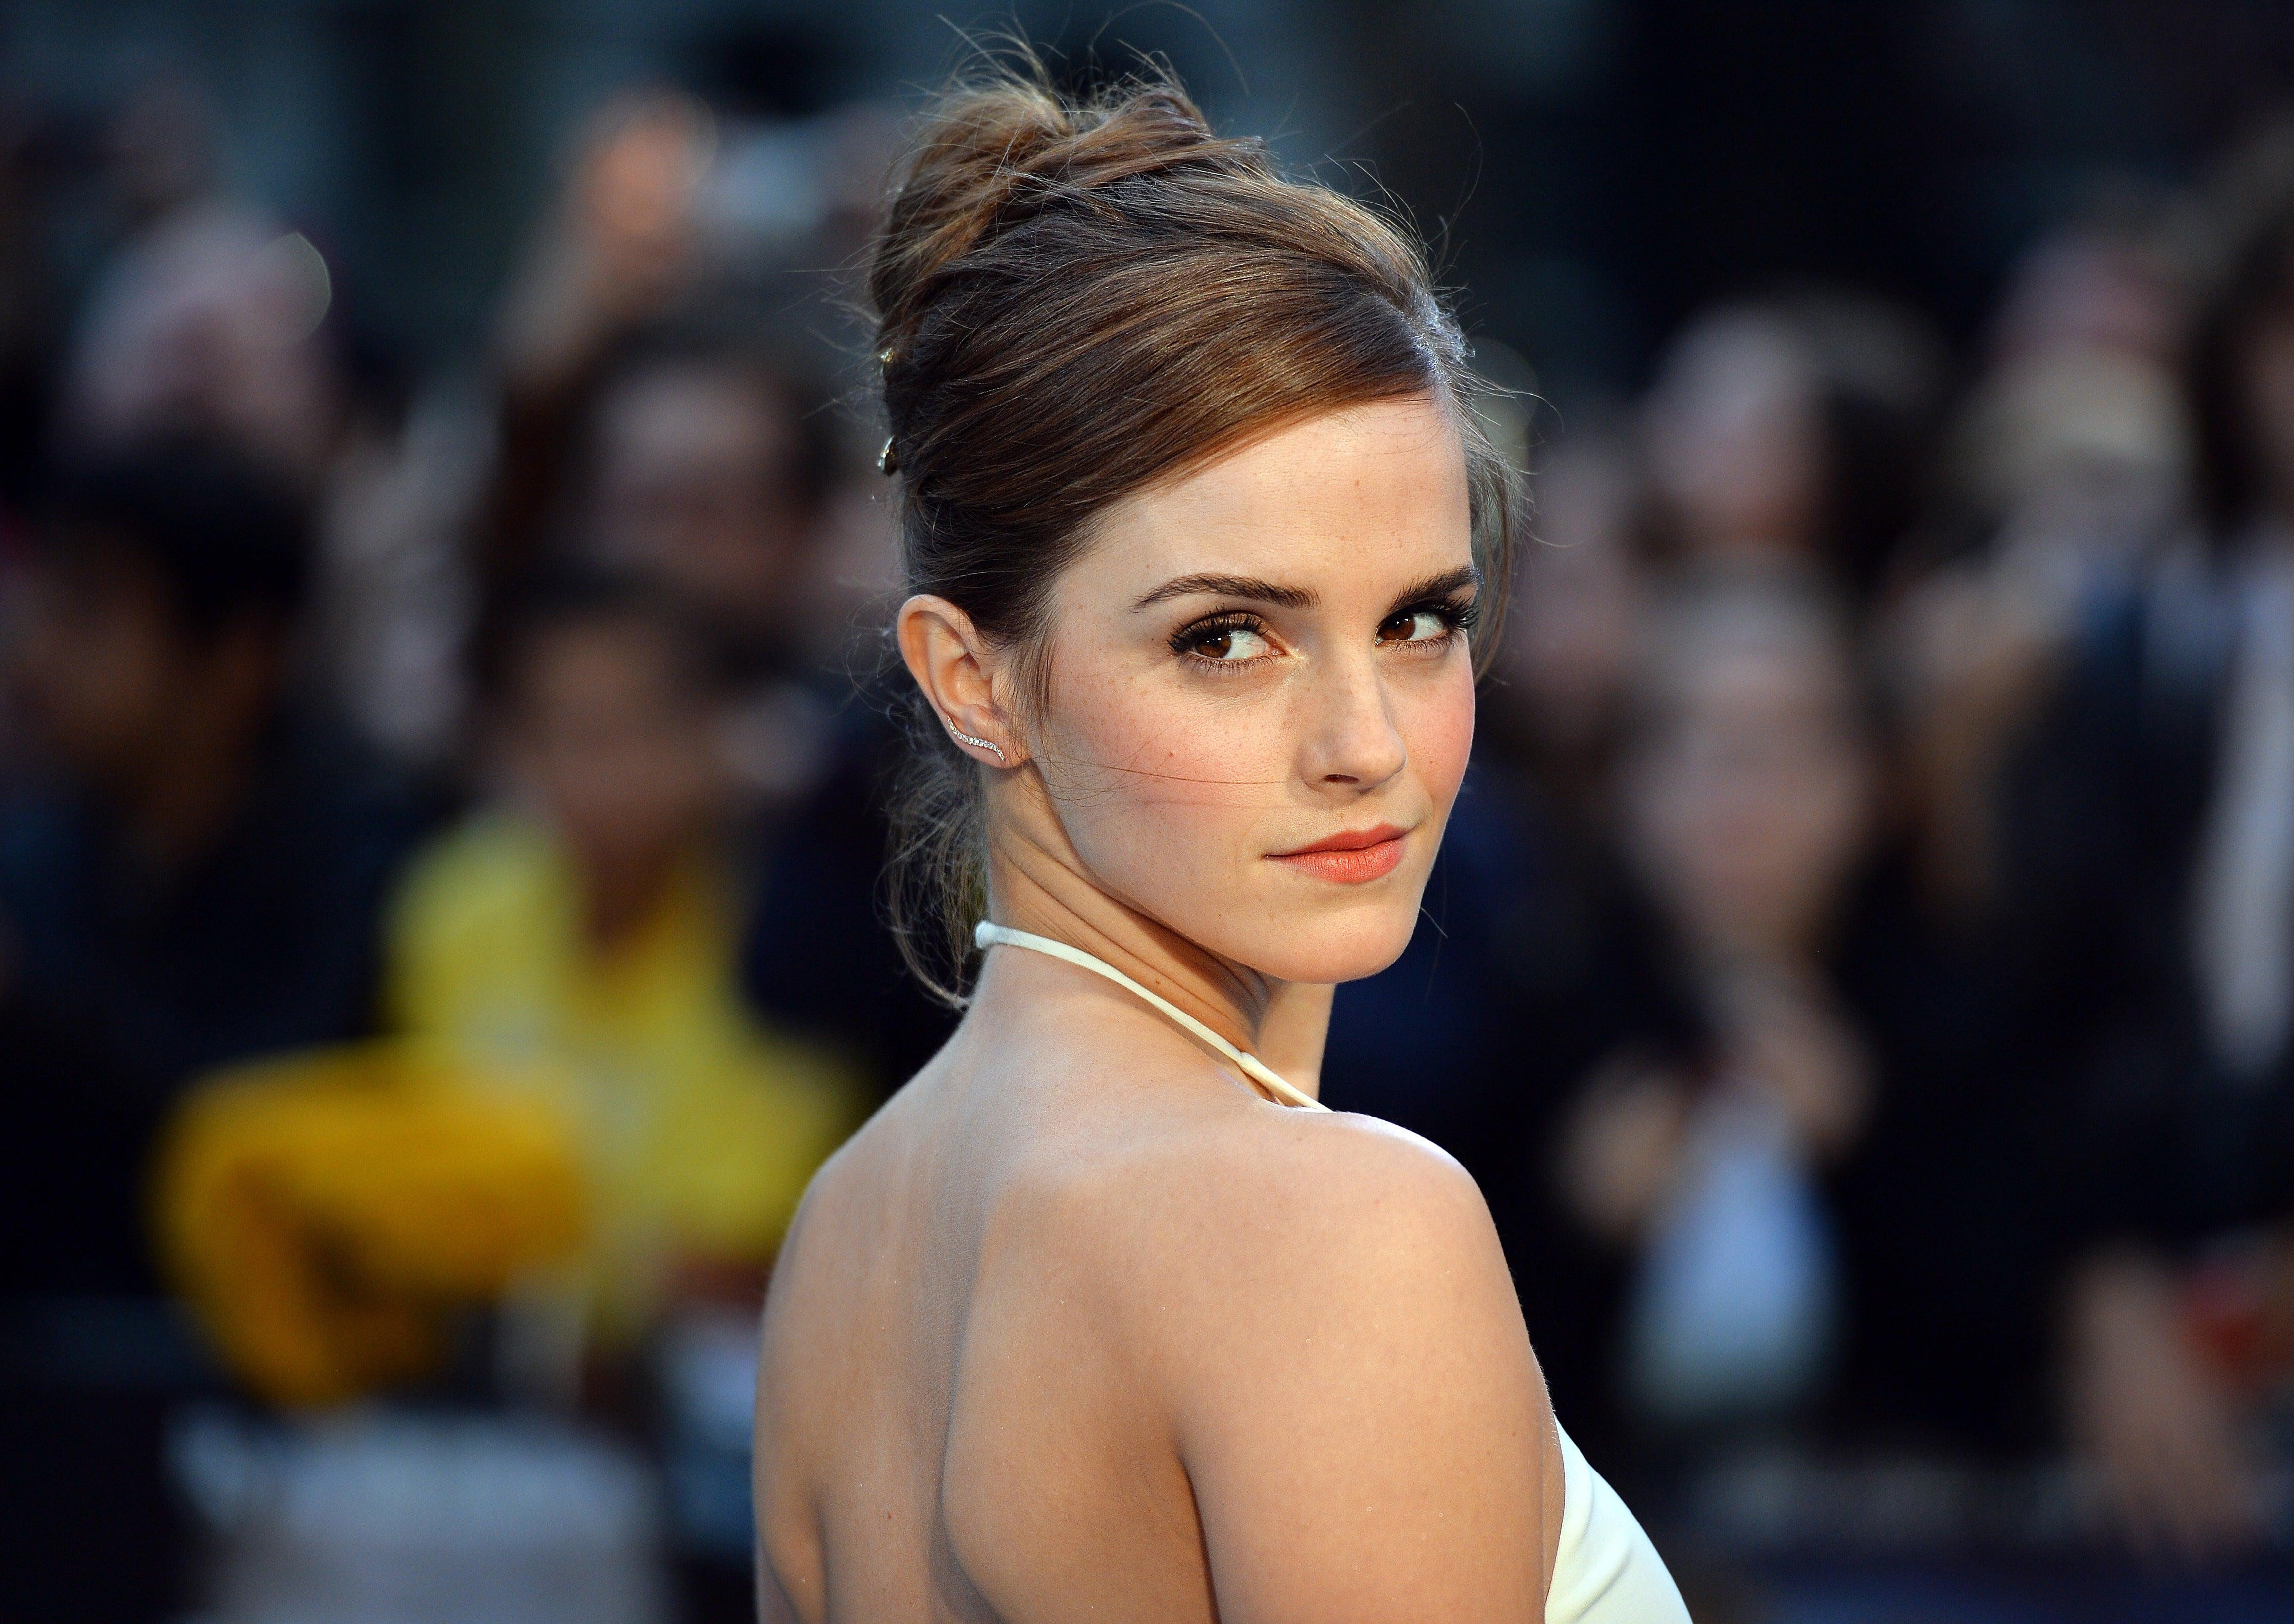 Emma-Watson-50-Beauty-Photos-21